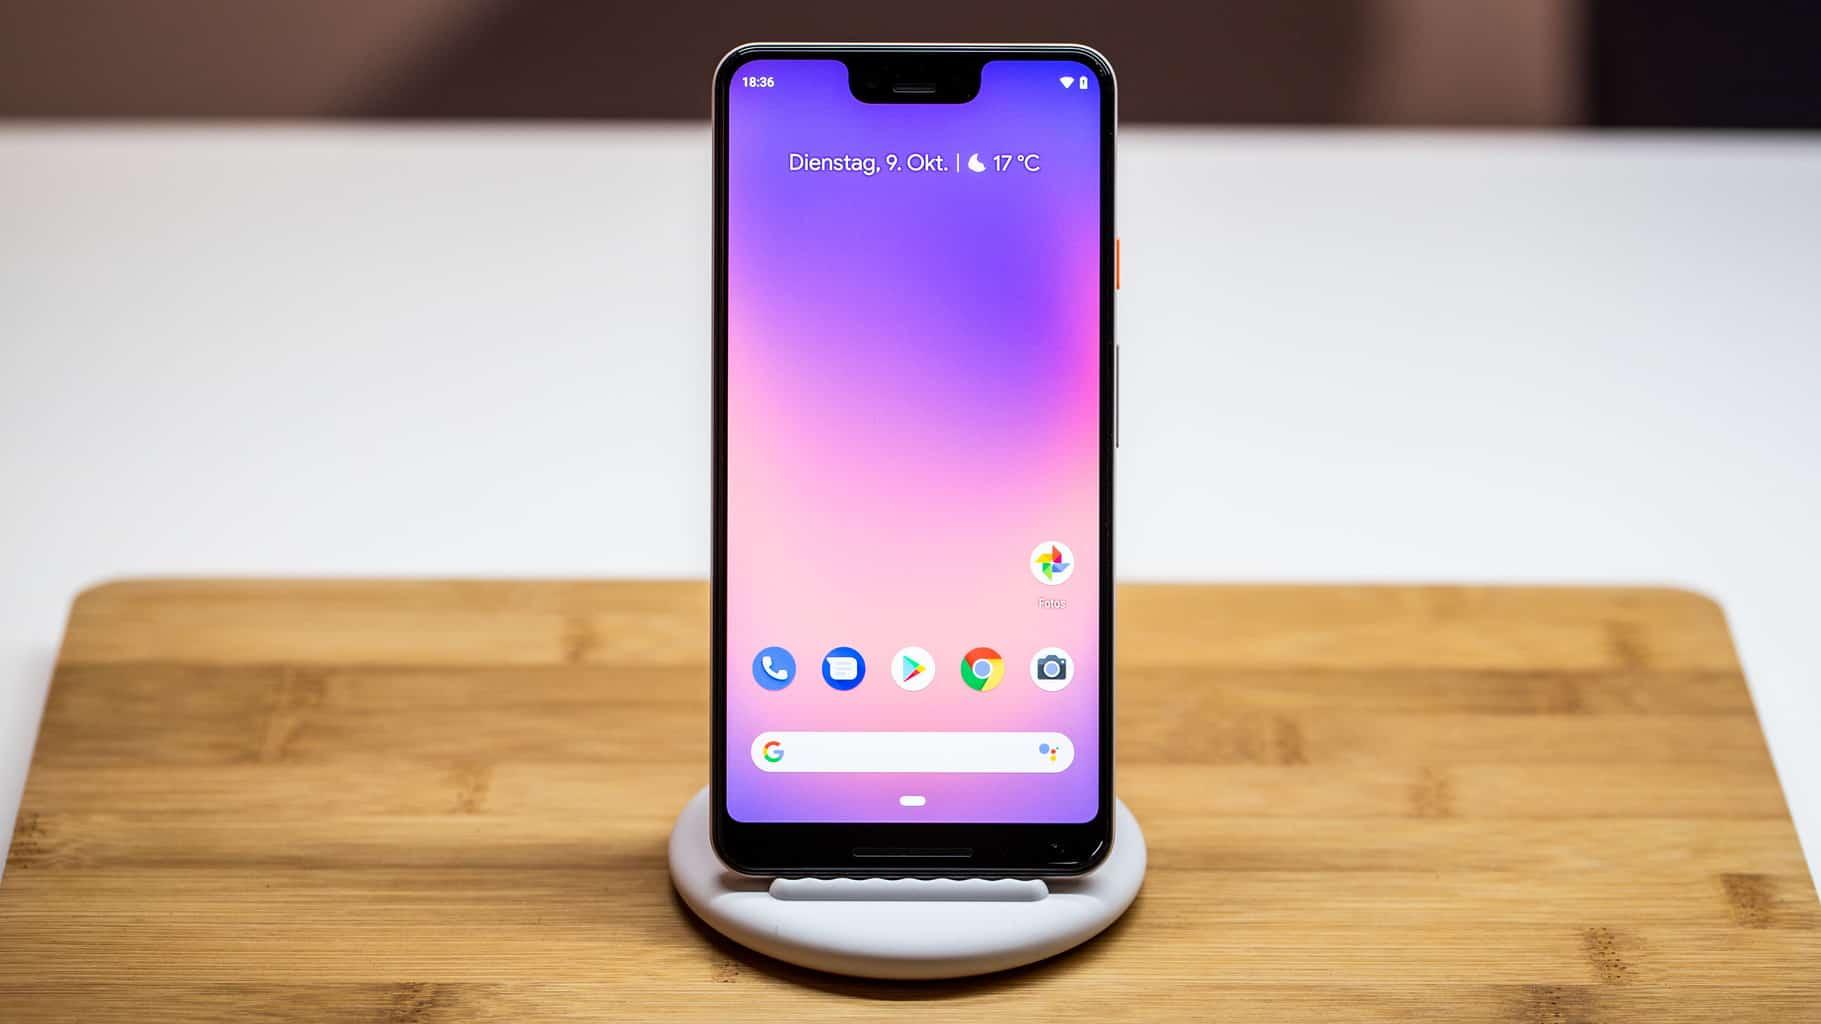 Google presenta i nuovi smartphone Pixel e Pixel XL 3